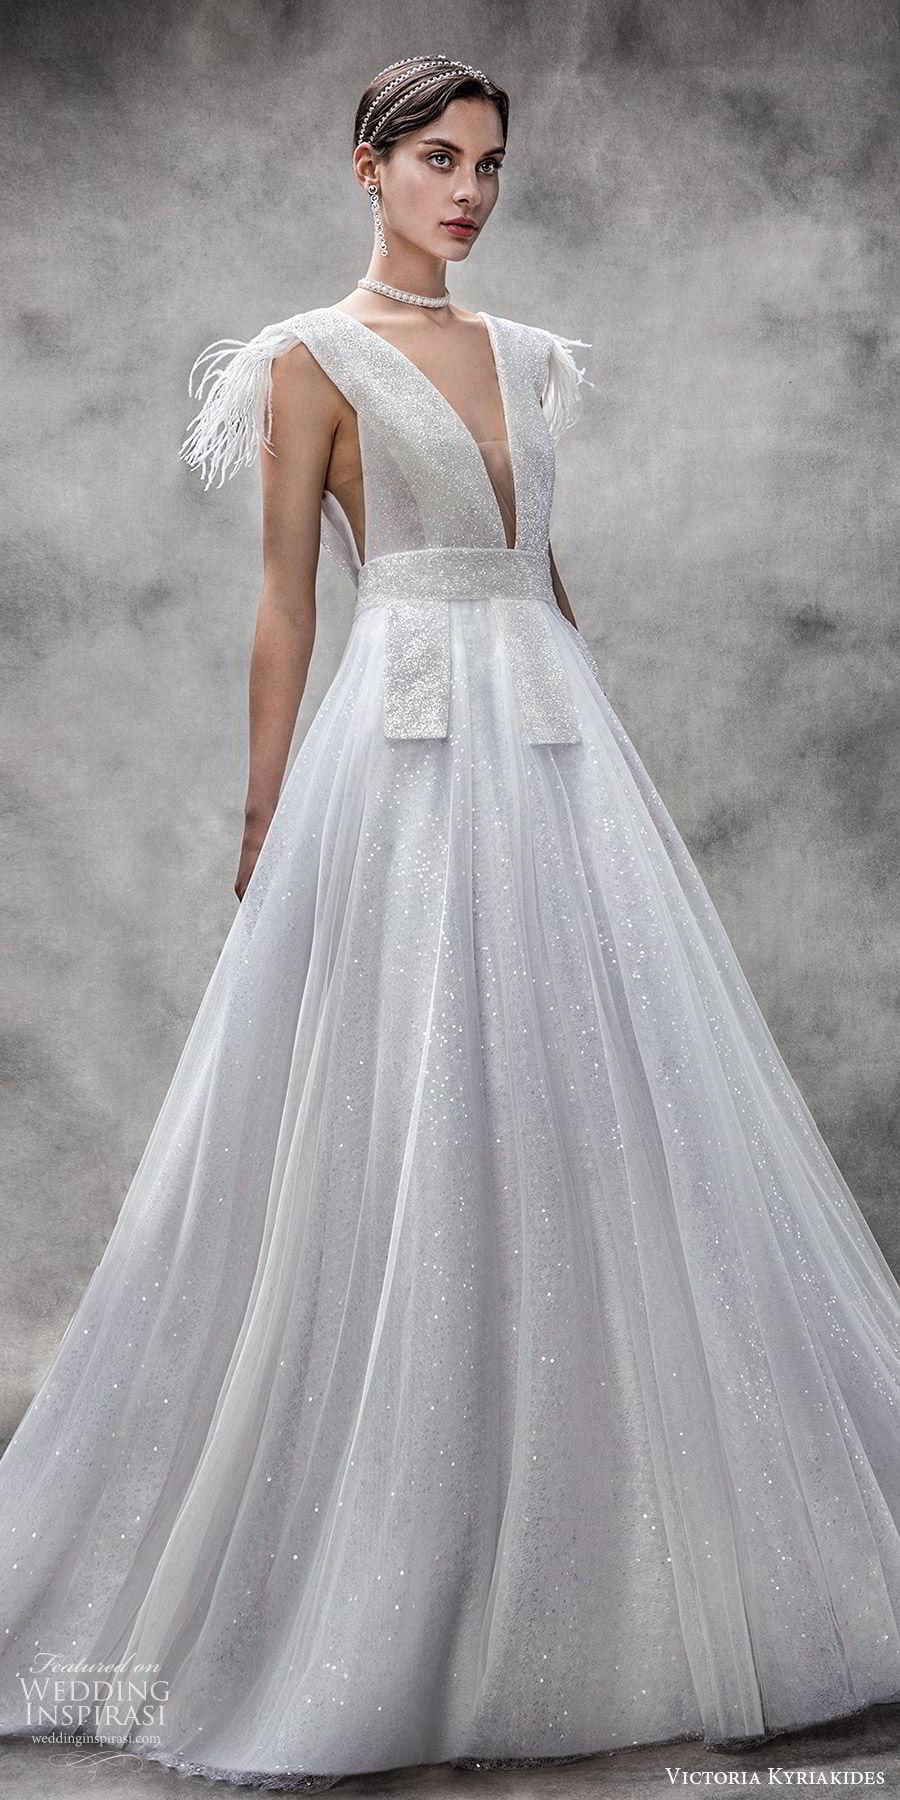 victoria kyriakides spring 2020 bridal sleeveless thick straps deep v neckline a line ball gown wedding dress (2) glitzy romantic mv